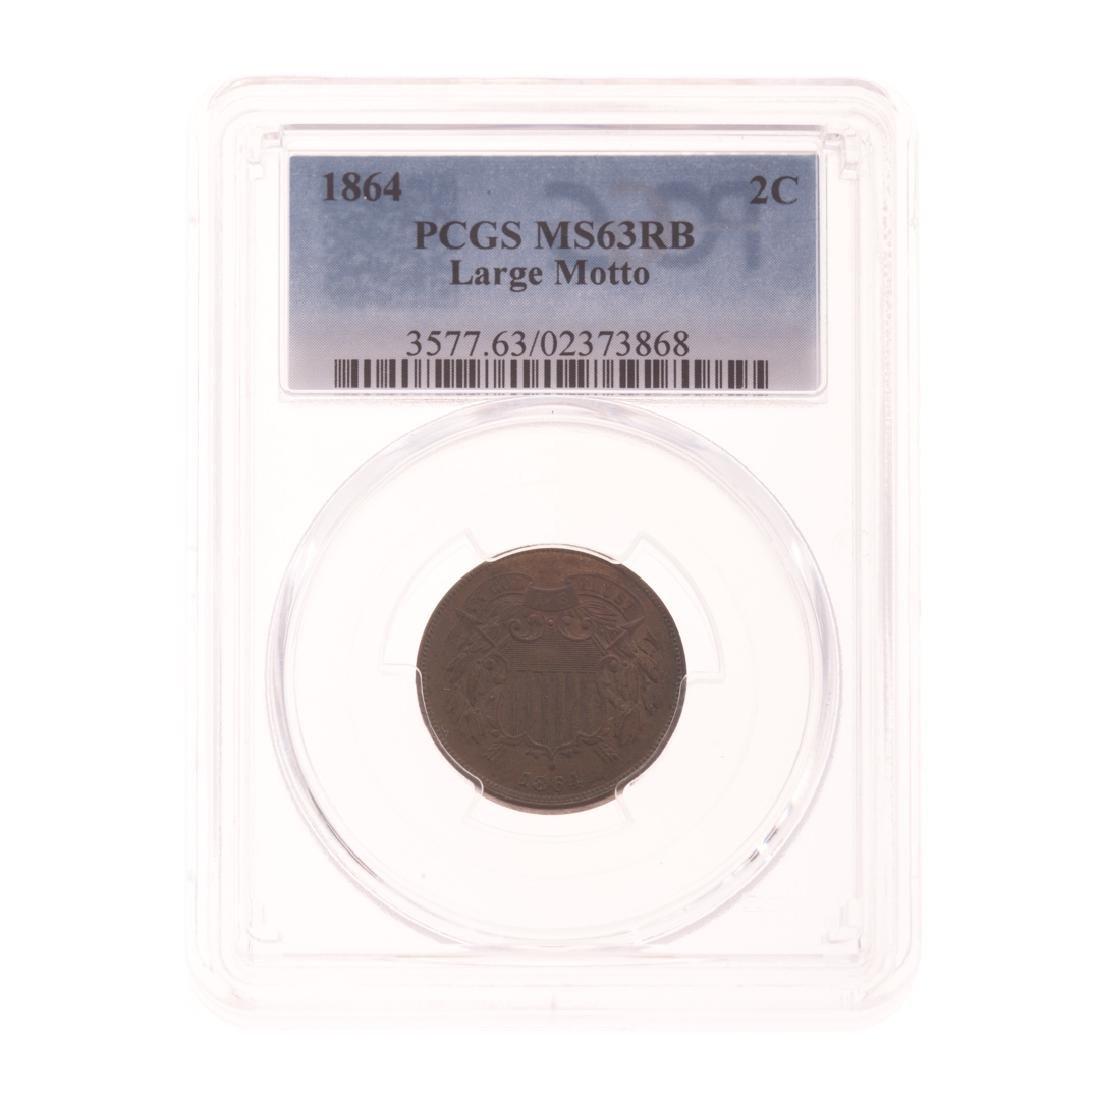 [US] 1864 2 Cent Piece Large Motto PCGS MS63RB